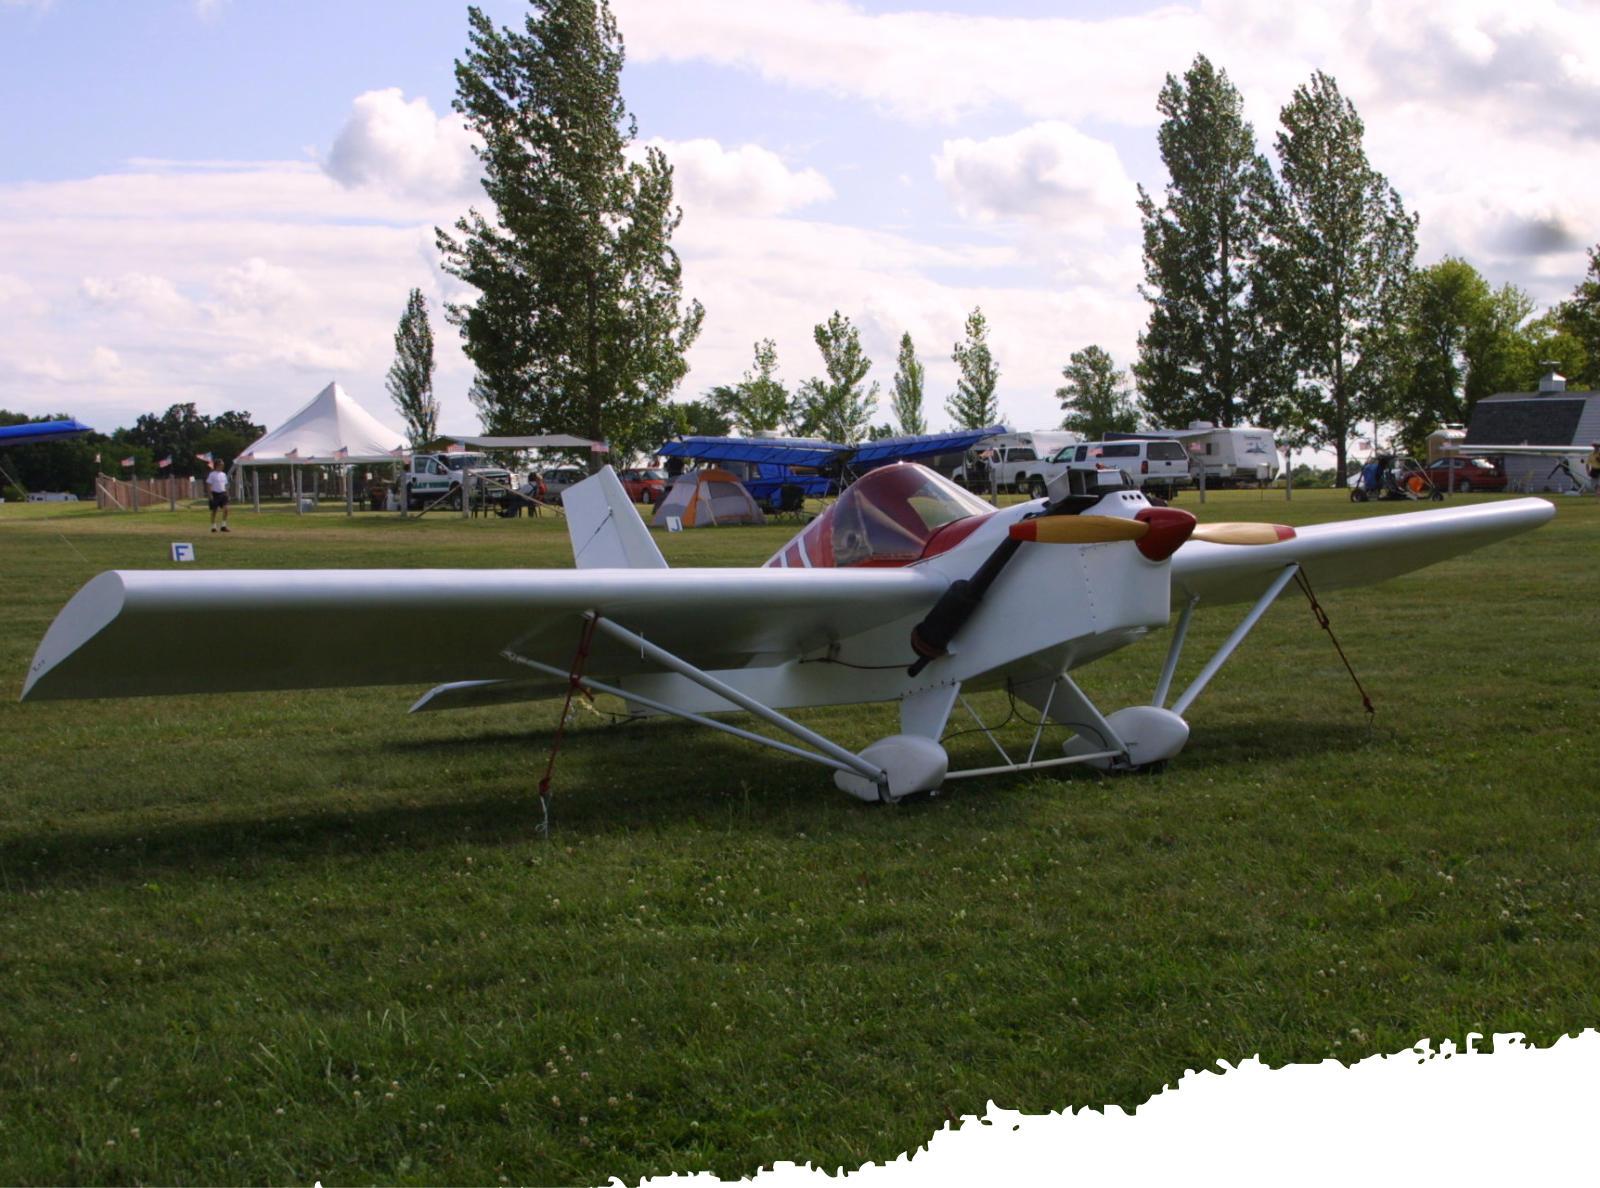 TEAM Mini Max - 12 Ultralight Aircraft that give the biggest bang